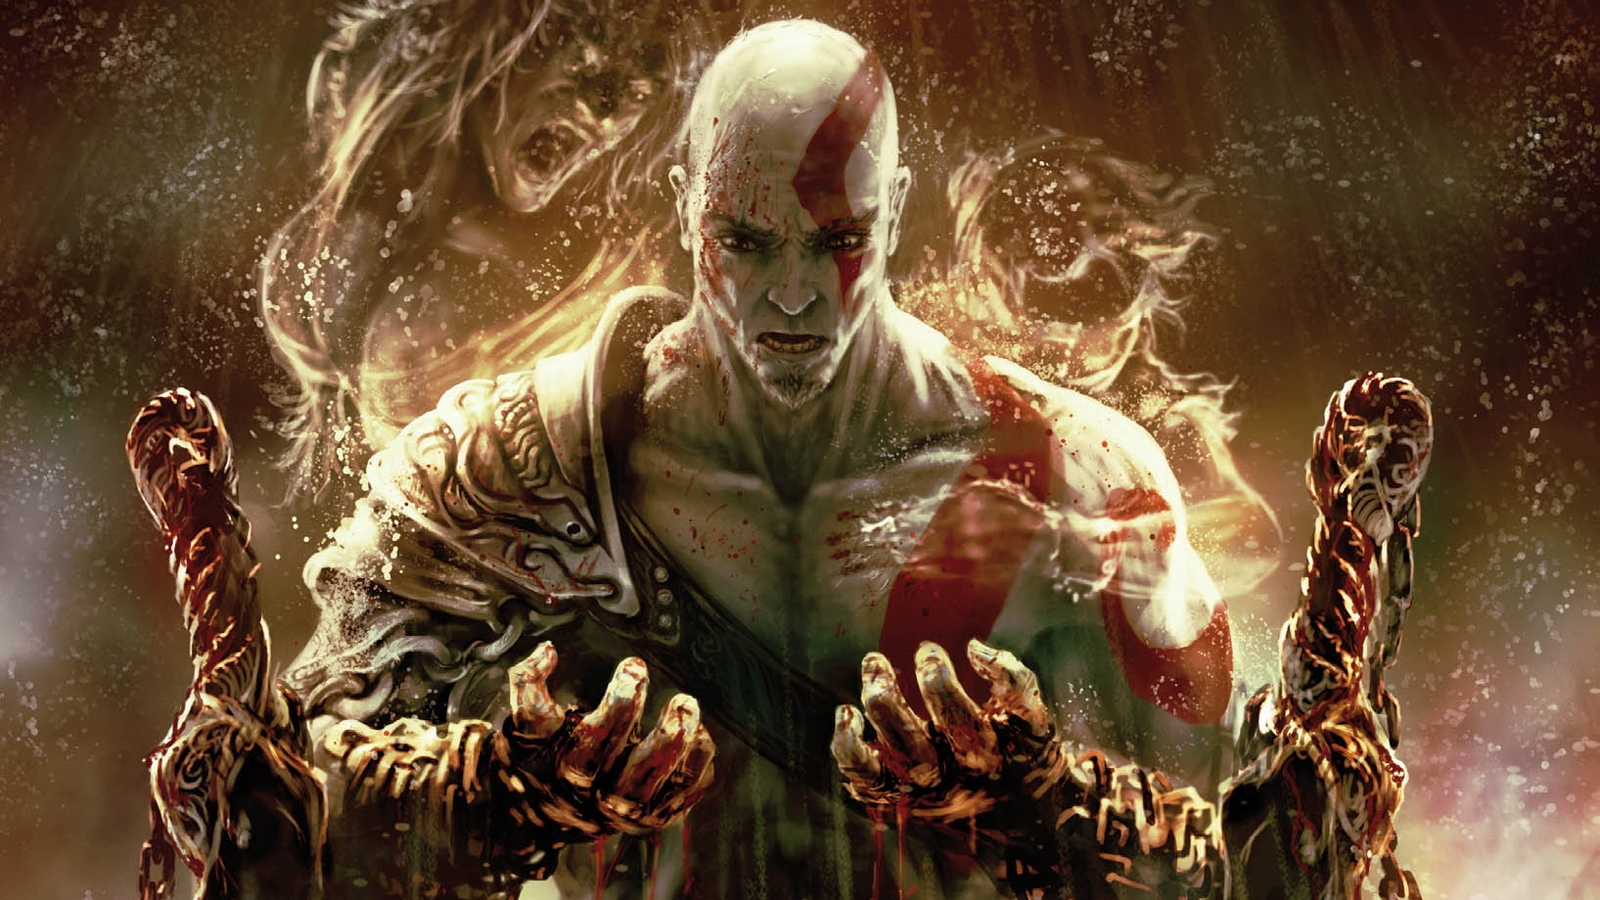 Image god of war 3 kratos wallpaper high definition number vs battles wiki fandom - Wallpaper kratos ...